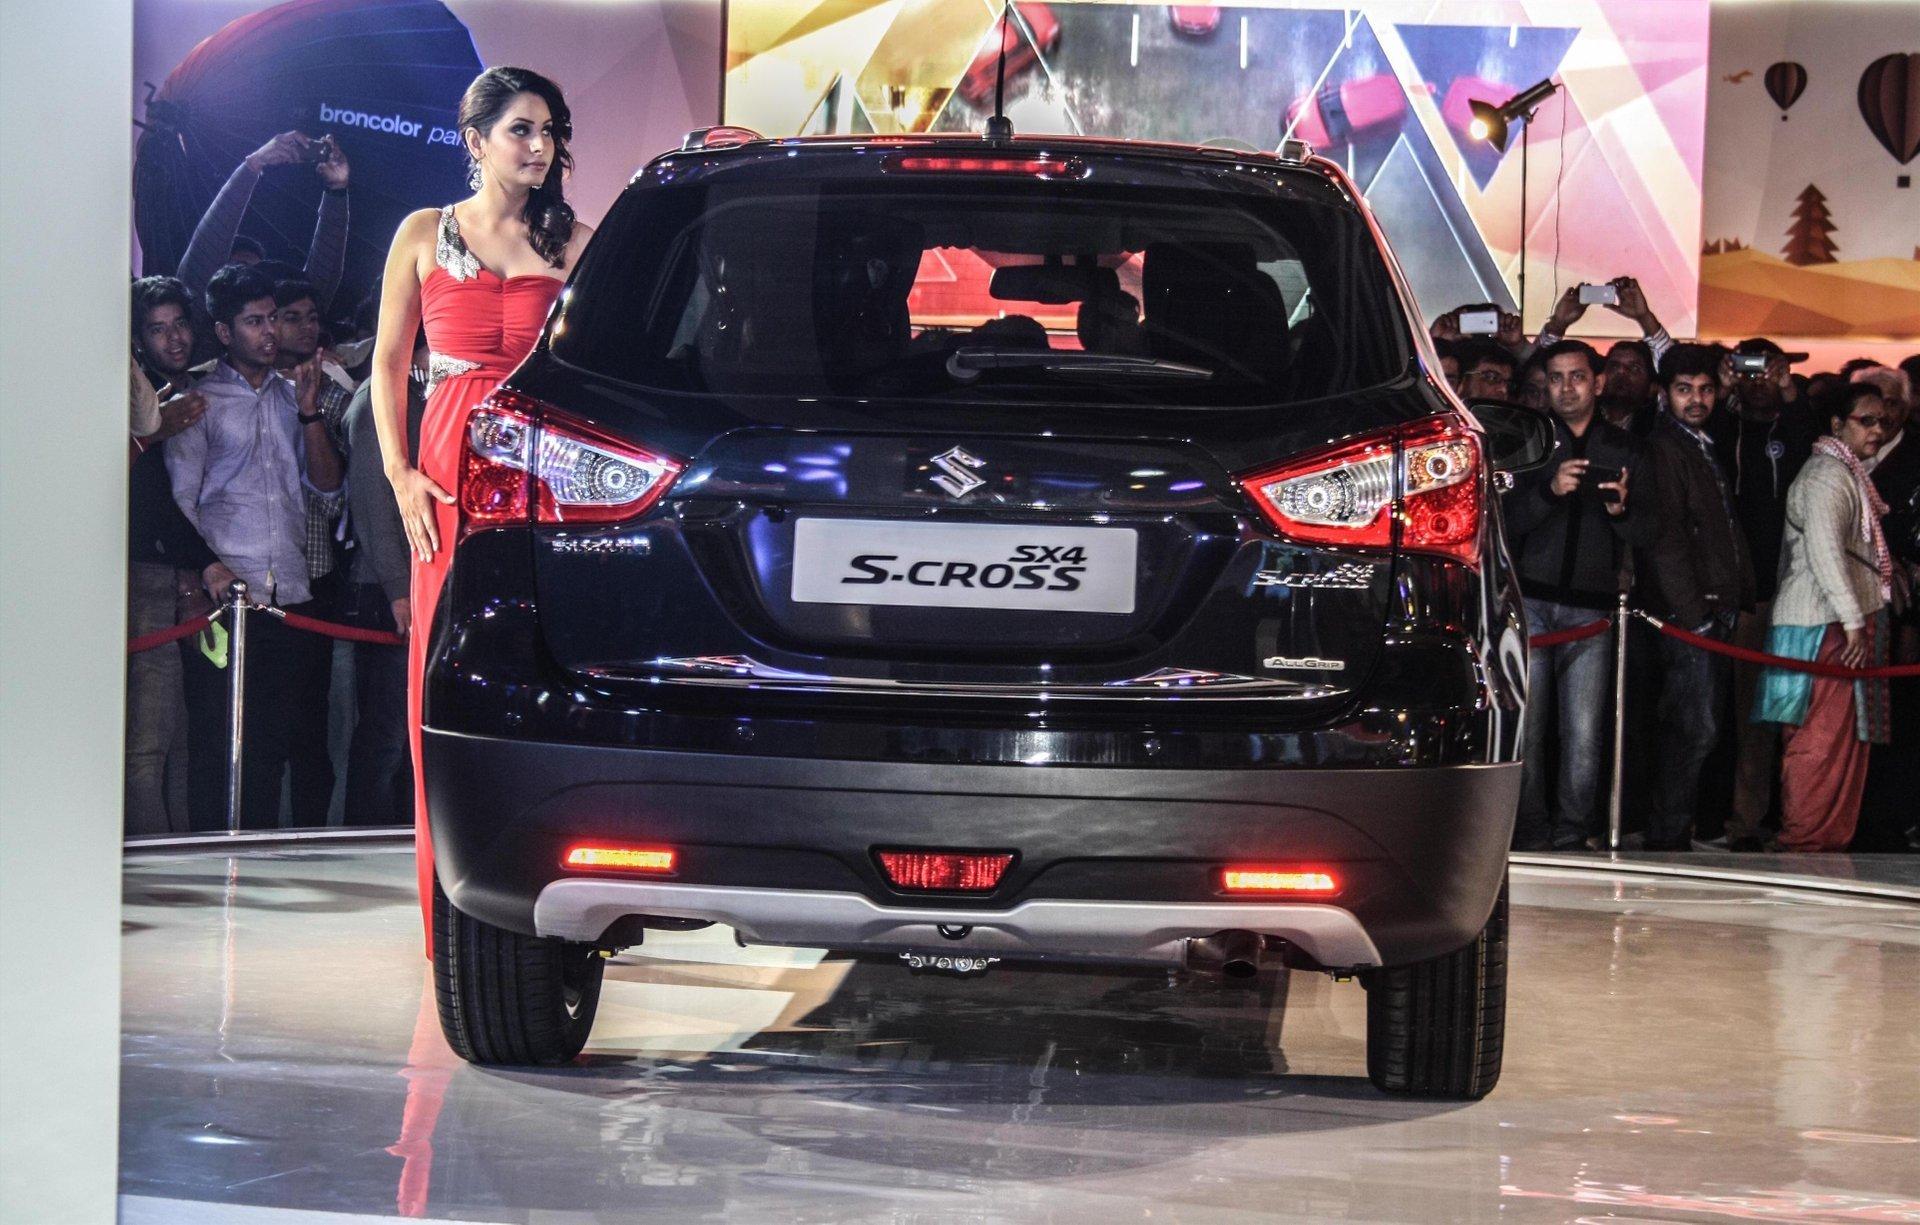 Auto Expo in India - Best Season 2020